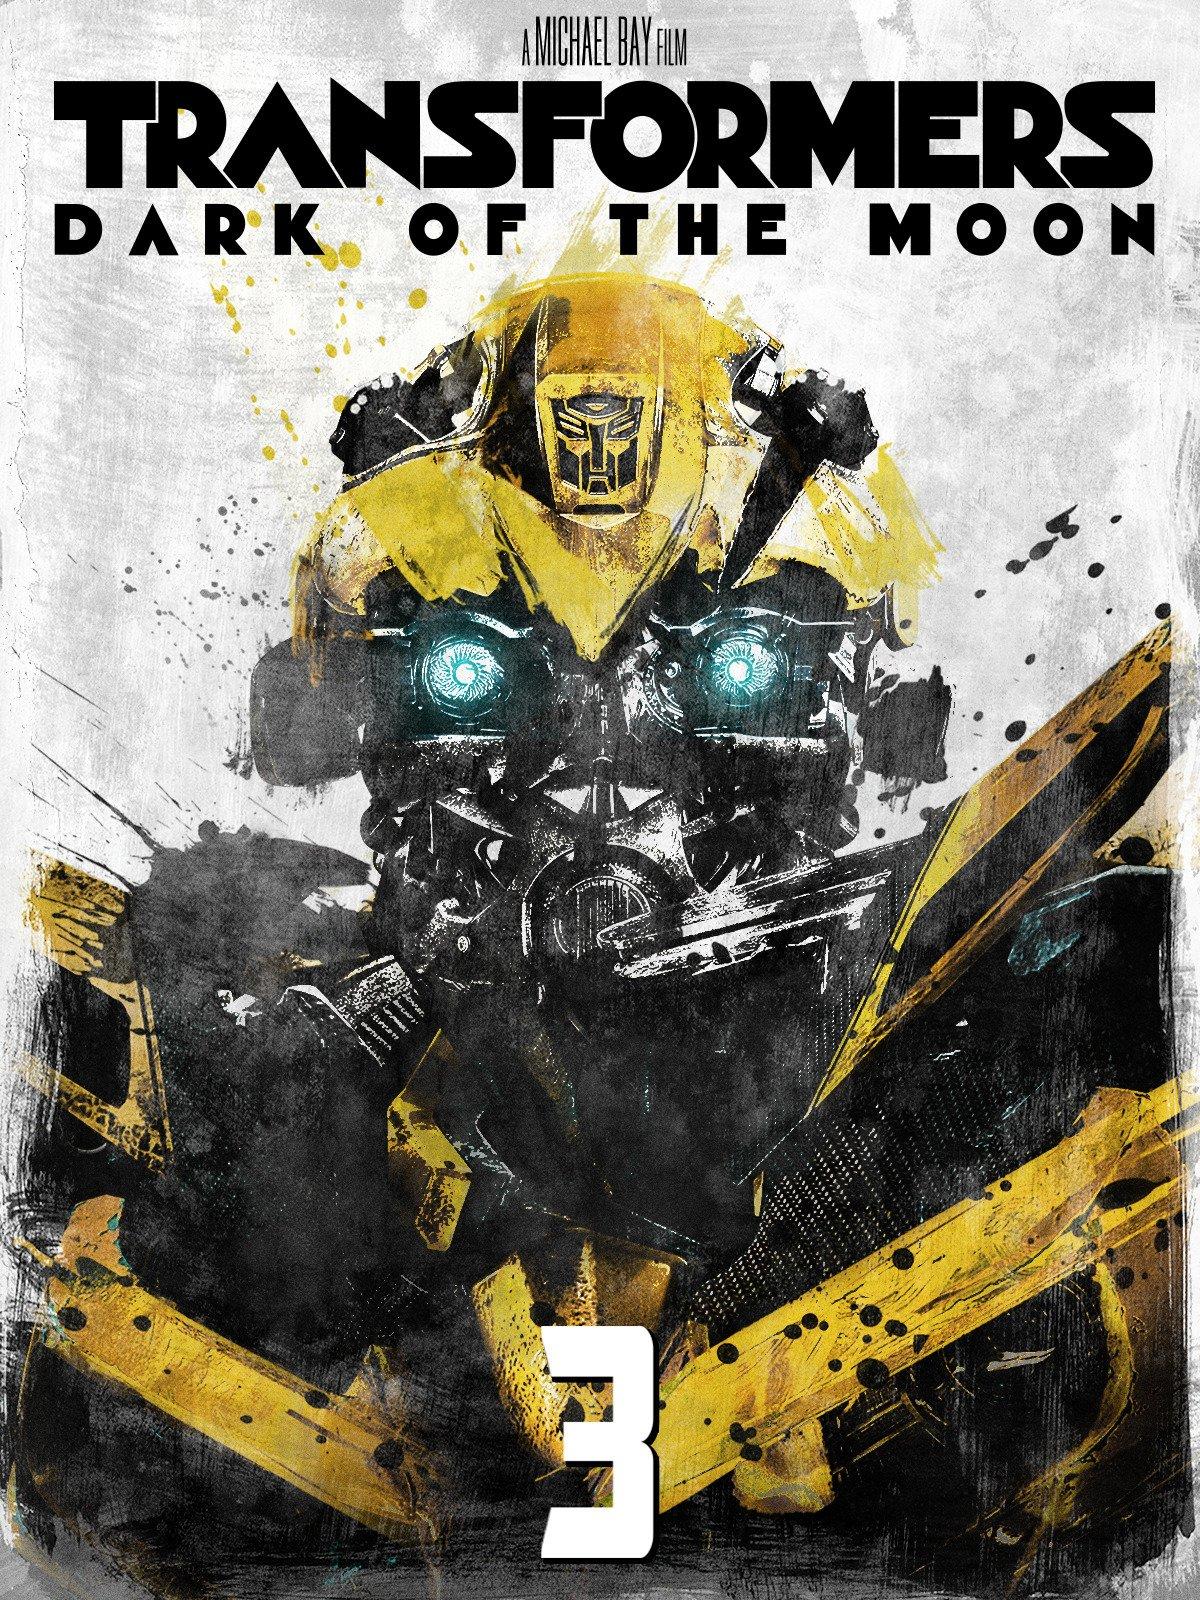 Amazon.com: Watch Transformers: Dark of the Moon | Prime Video